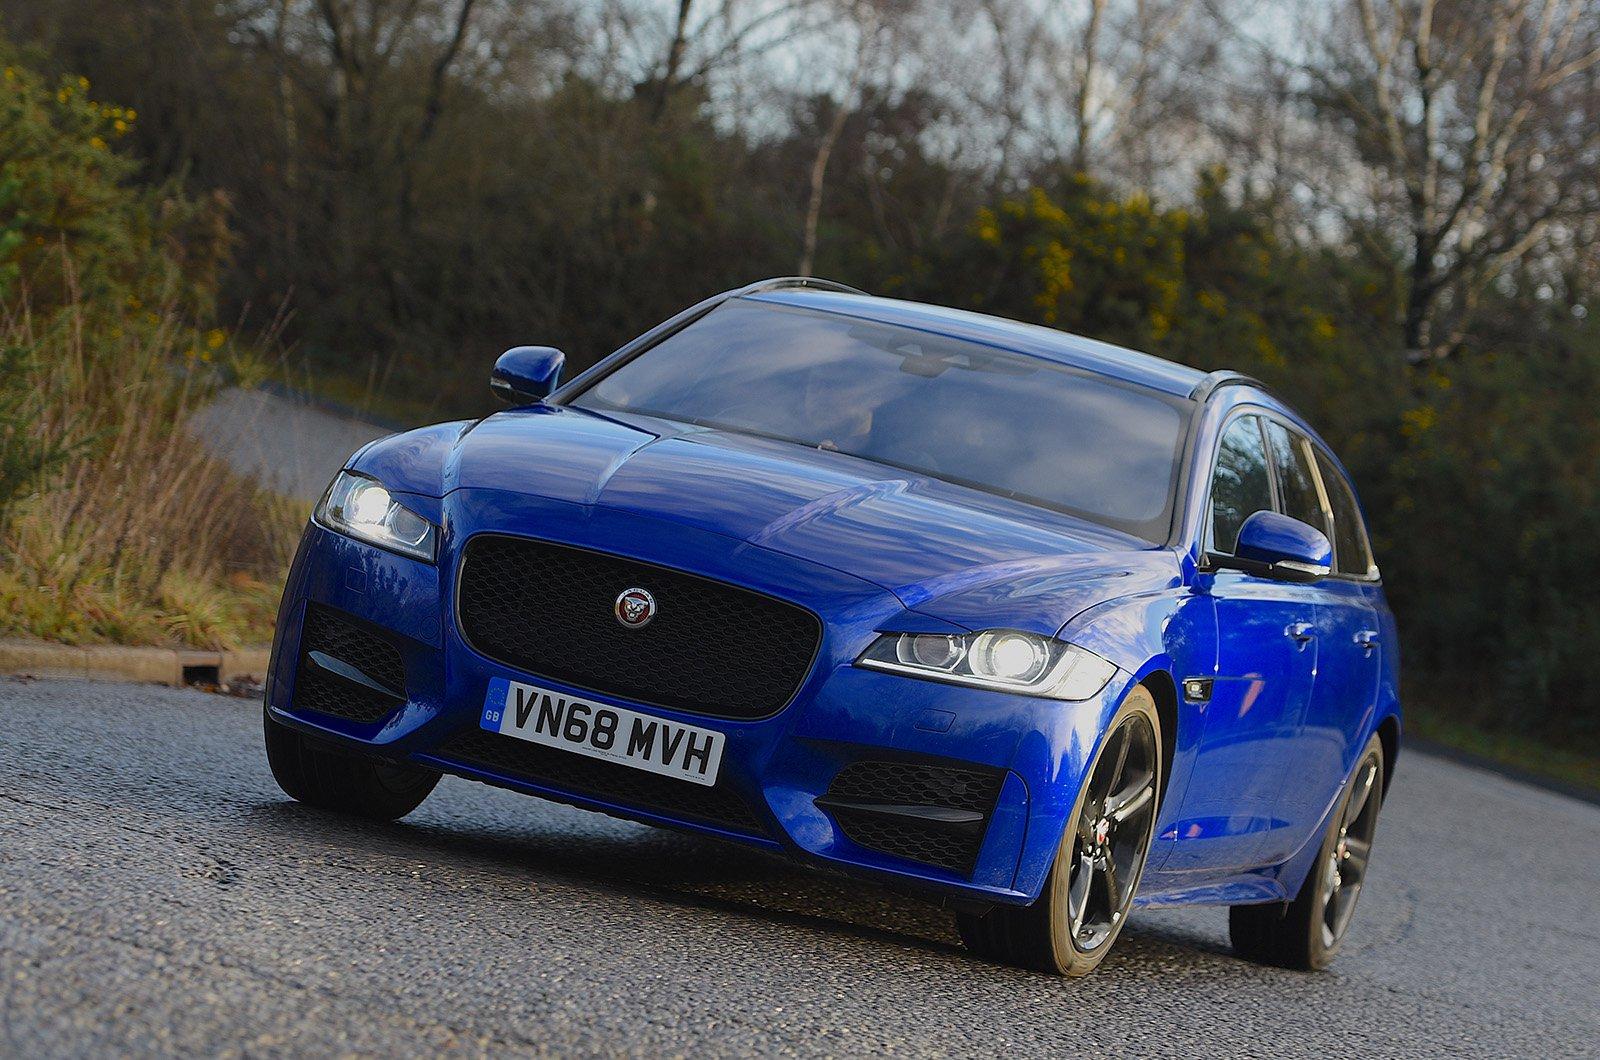 Used Jaguar XF long-term test review